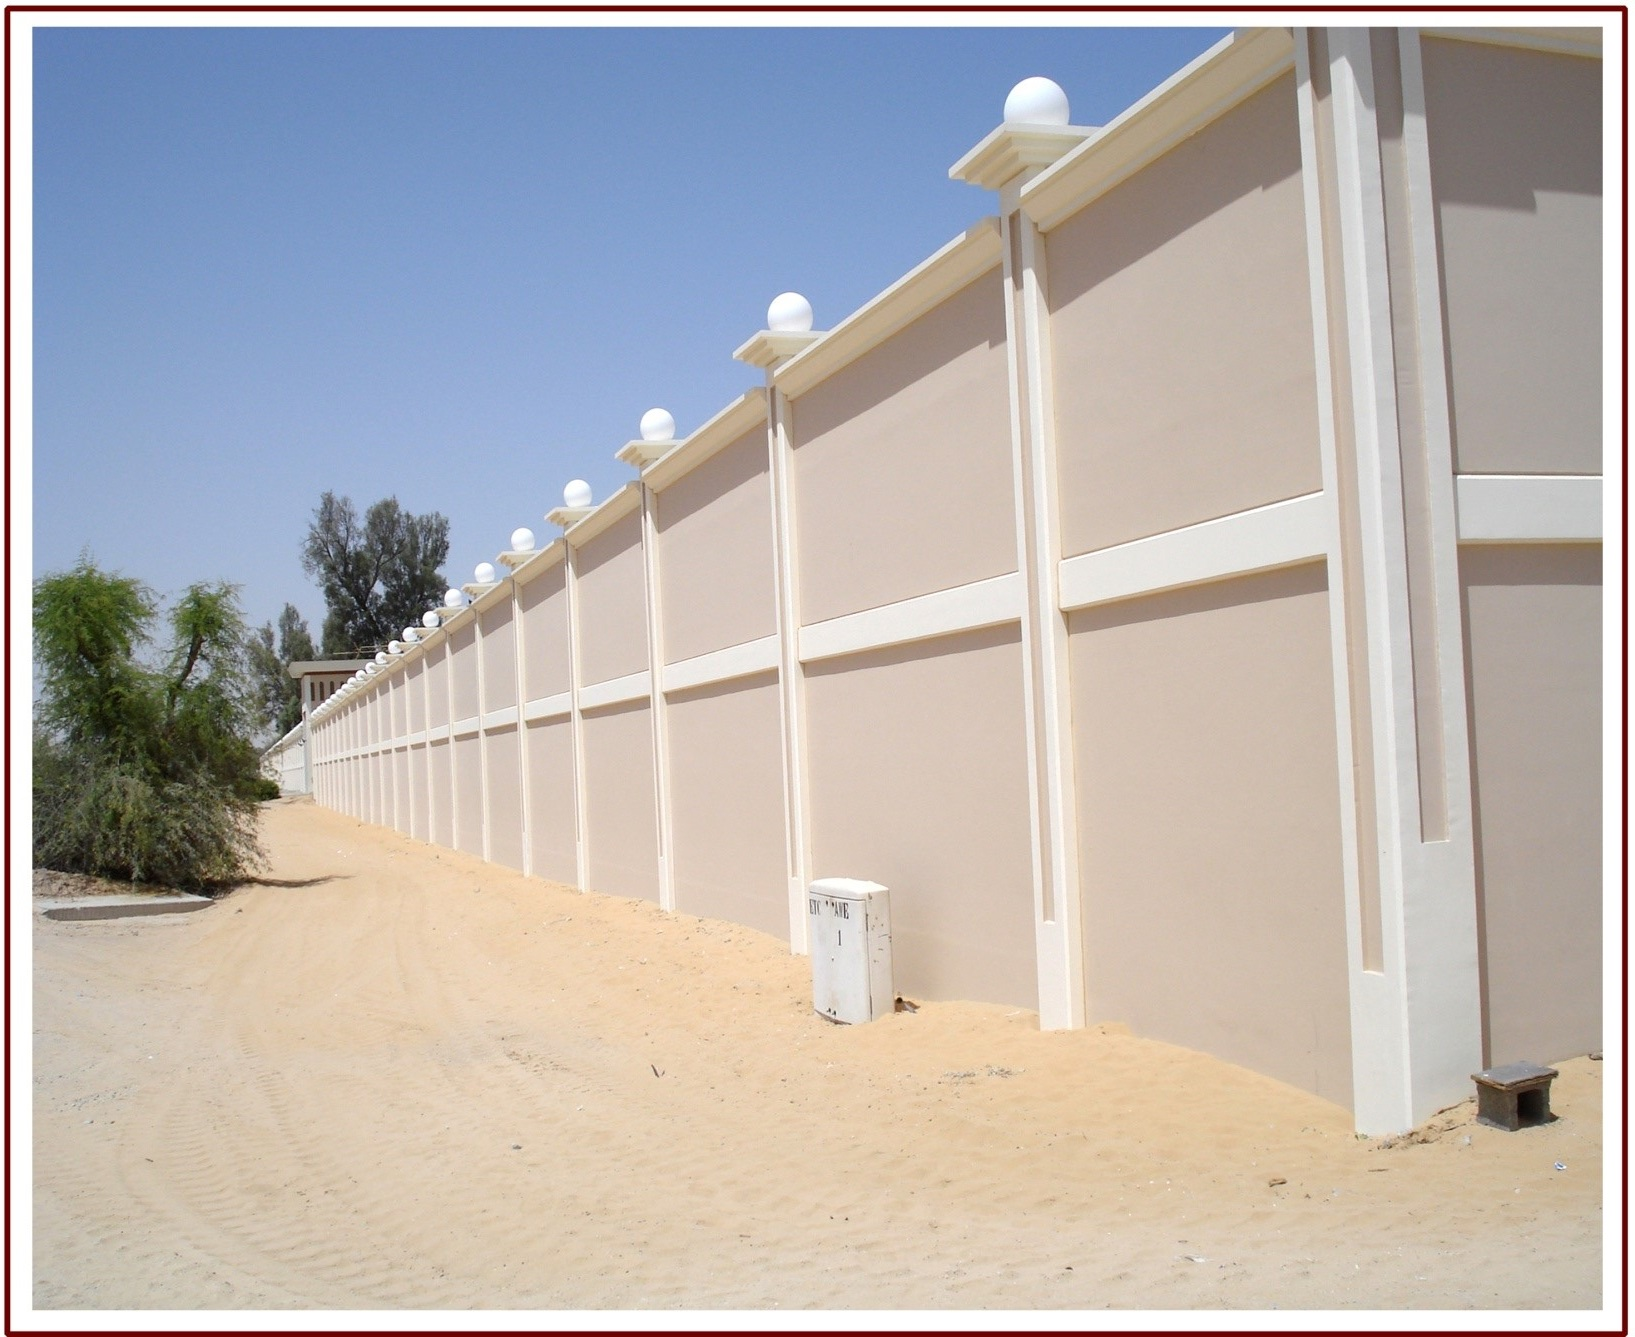 upf-qatar com | Concrete Precast Manufacturer in Qatar